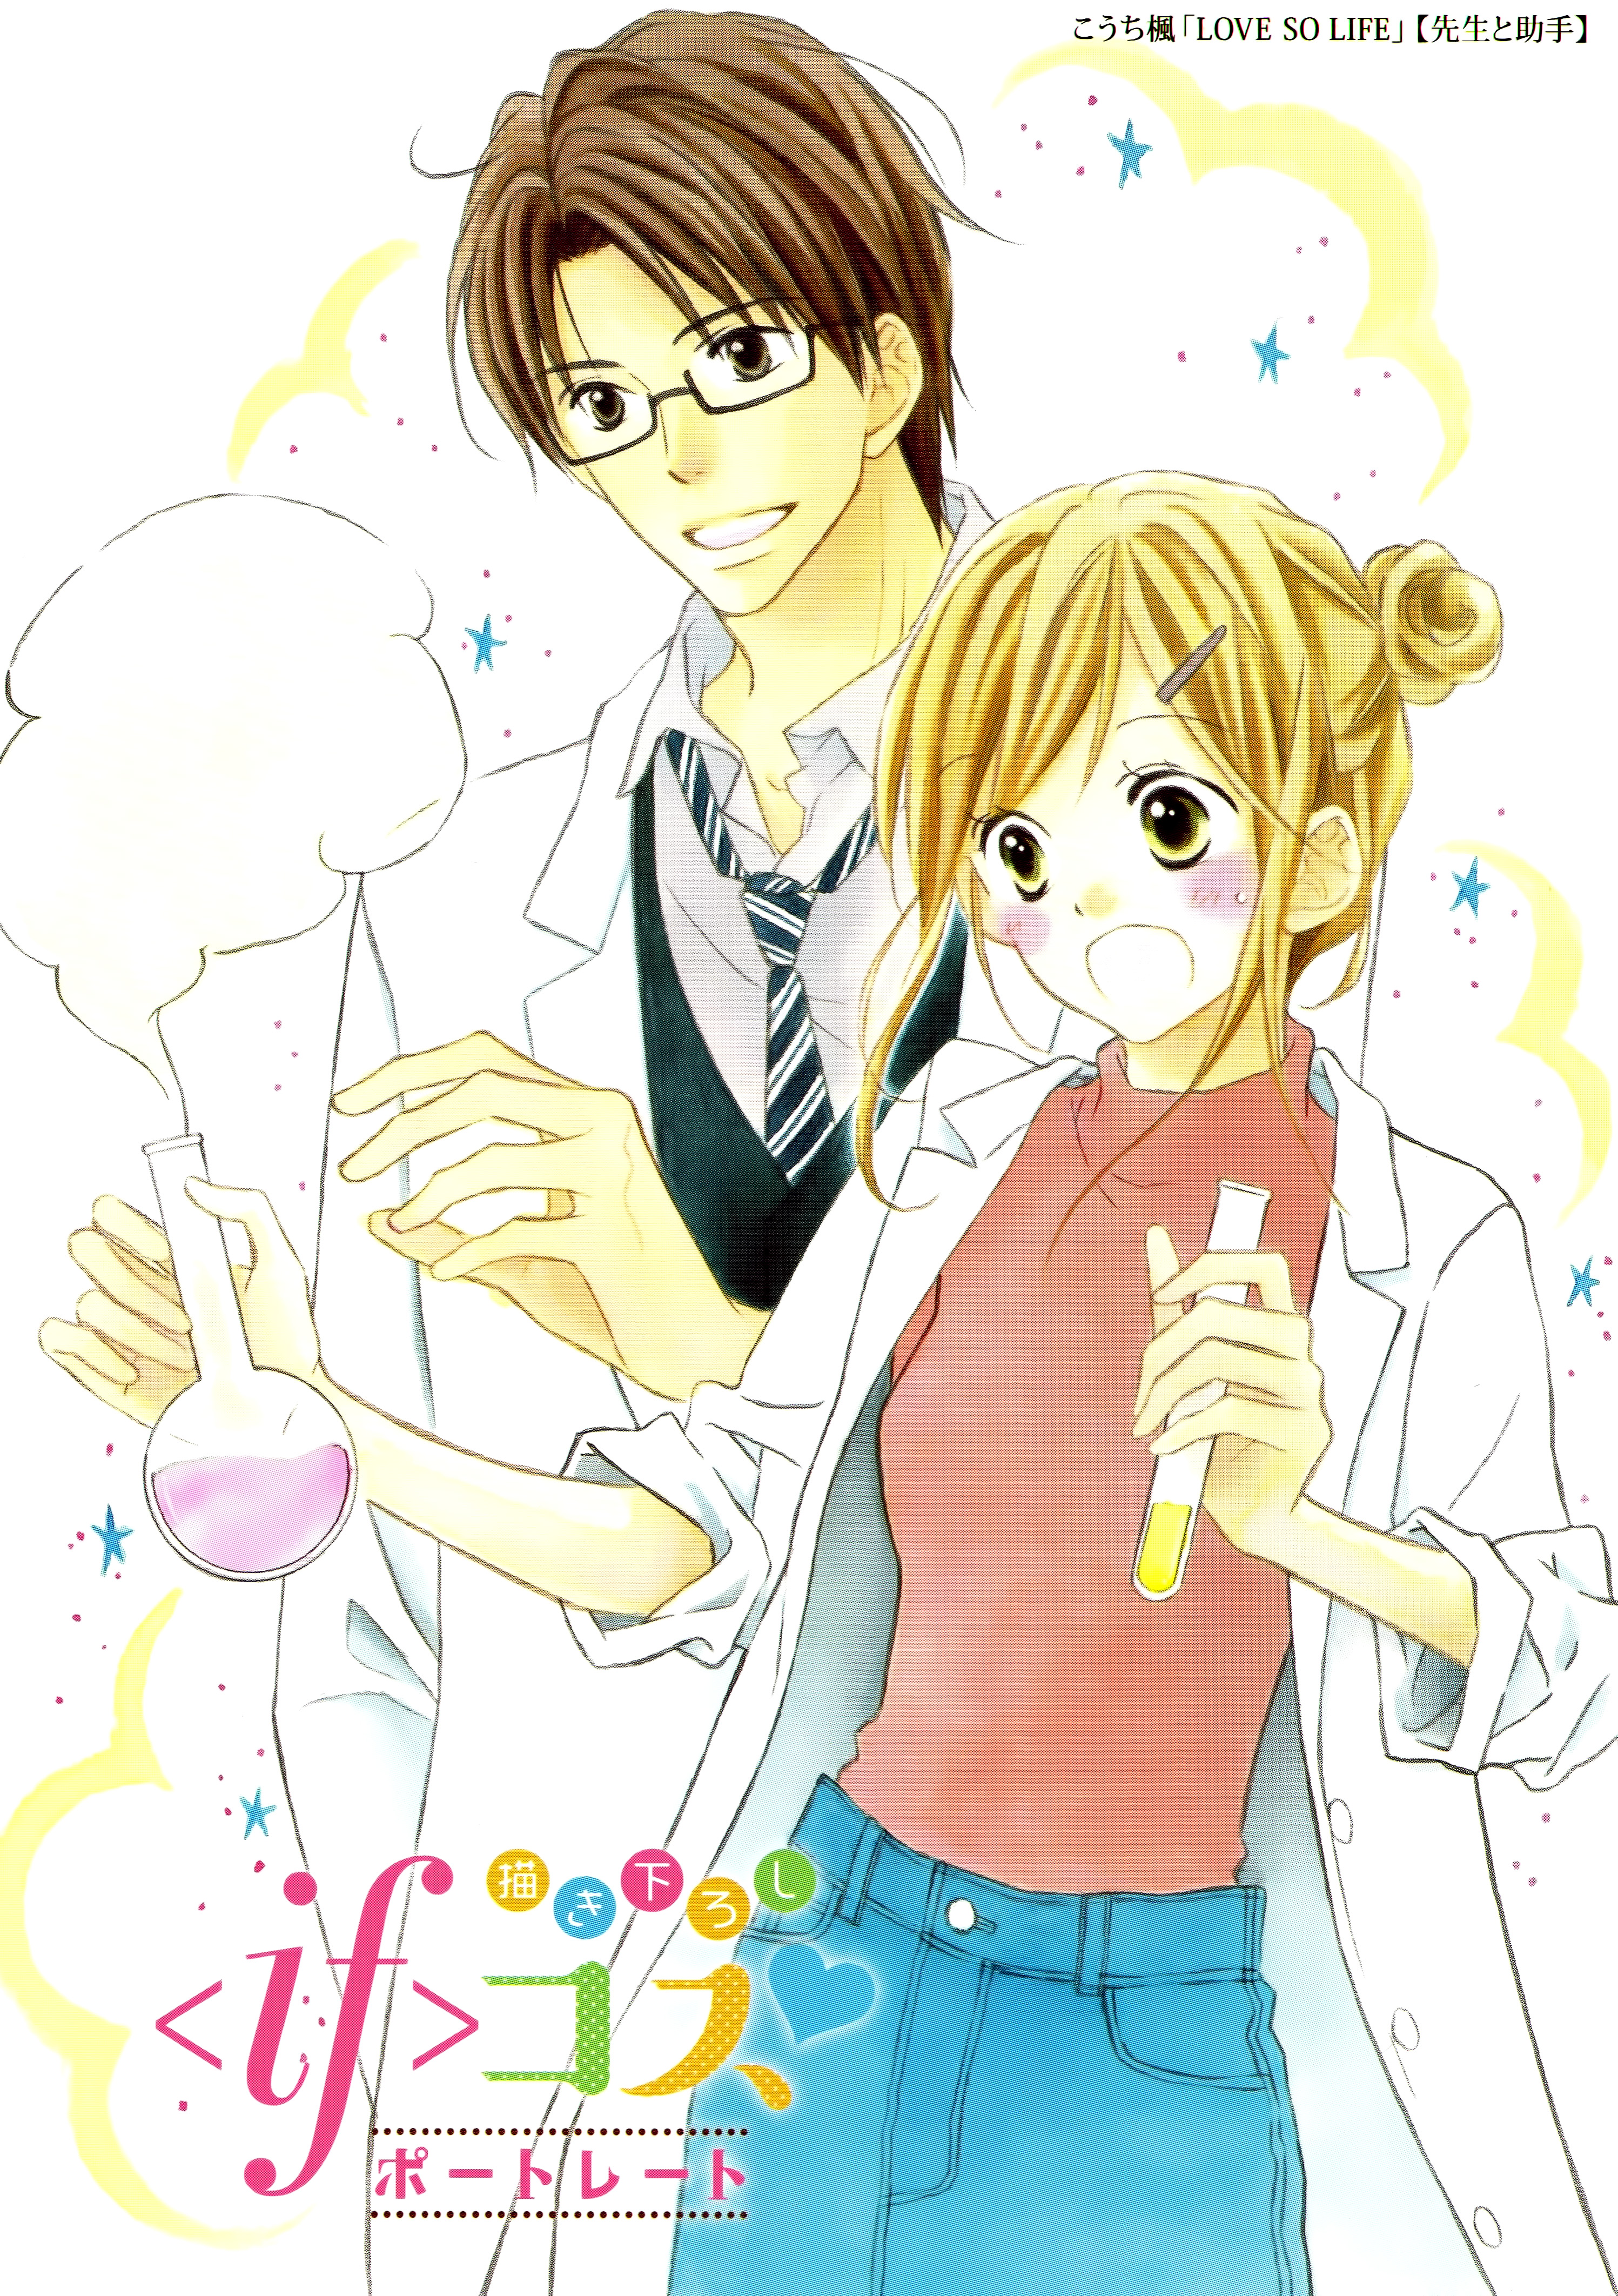 Love Life Anime